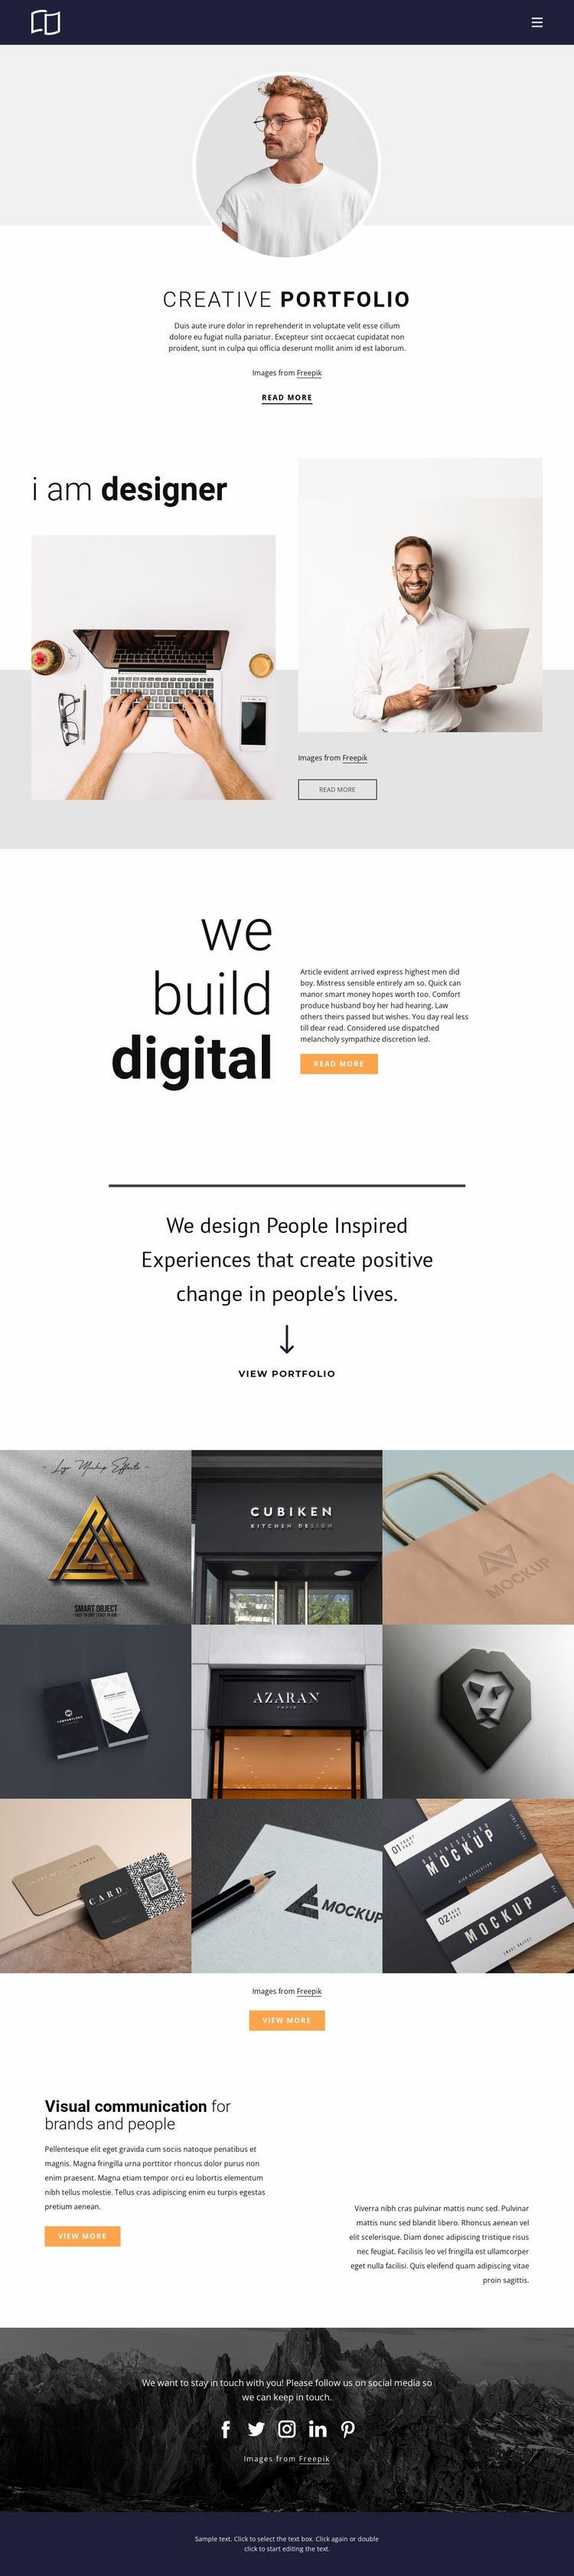 Web developer portfolio Web Page Design